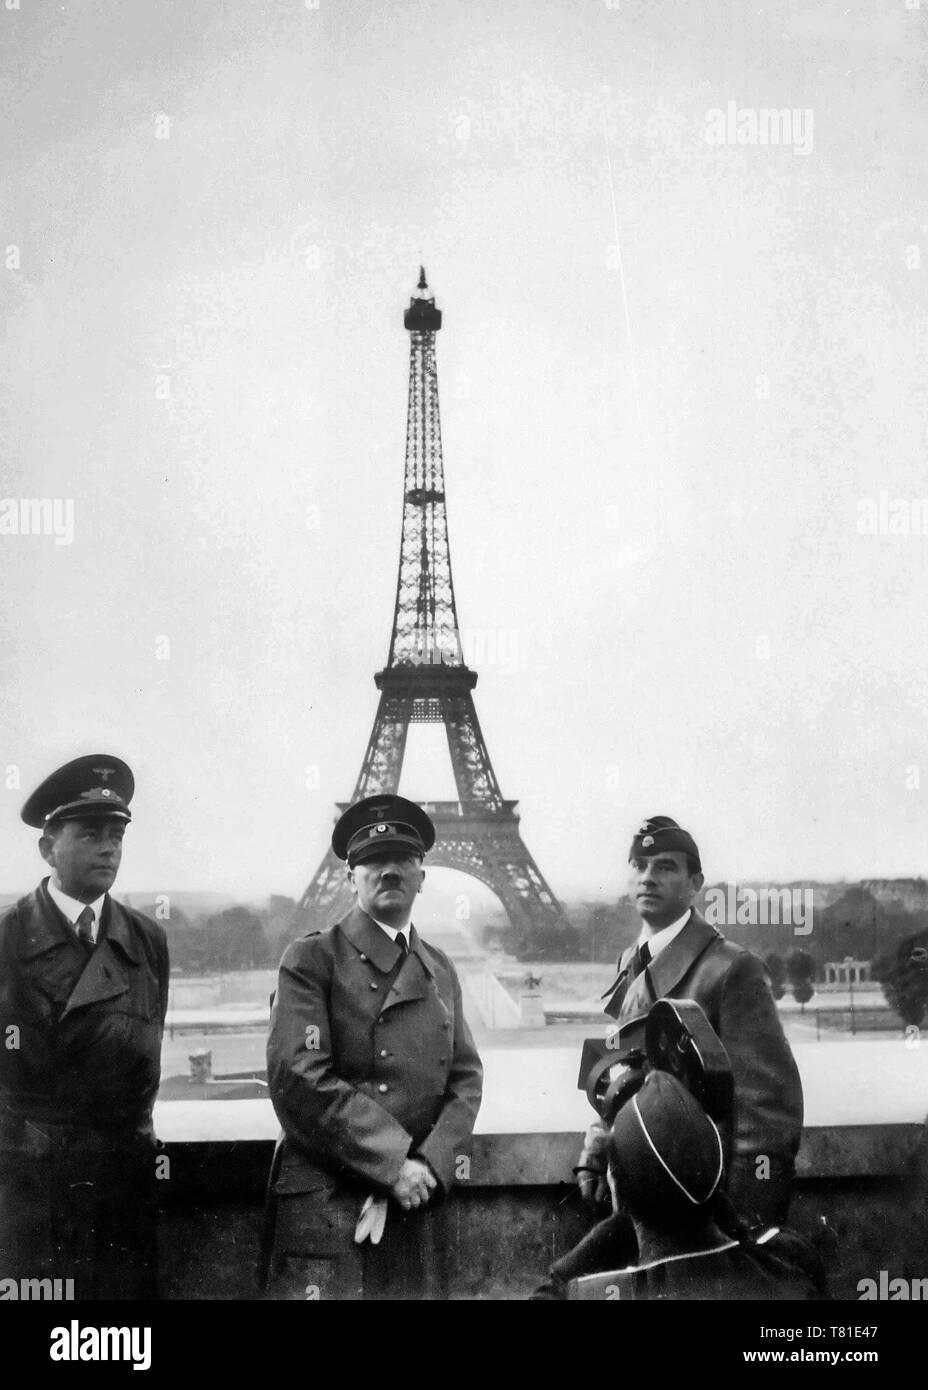 Adolf Hitler visits Paris with architect Albert Speer (left) and artist Arno Breker (right), June 23, 1940 - Stock Image